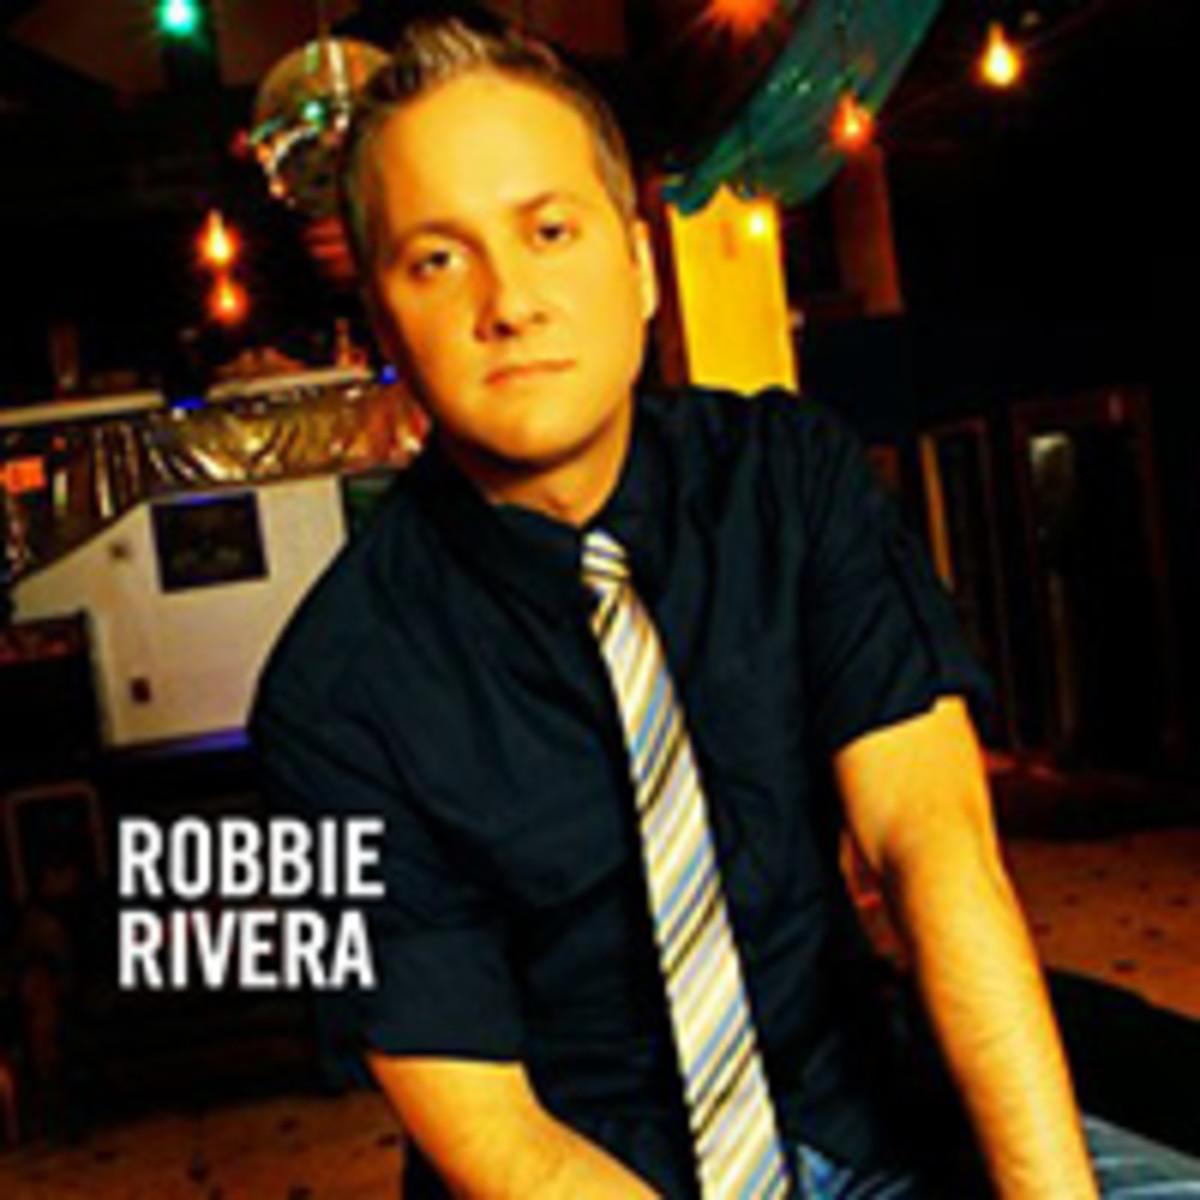 Robbie-Rivera